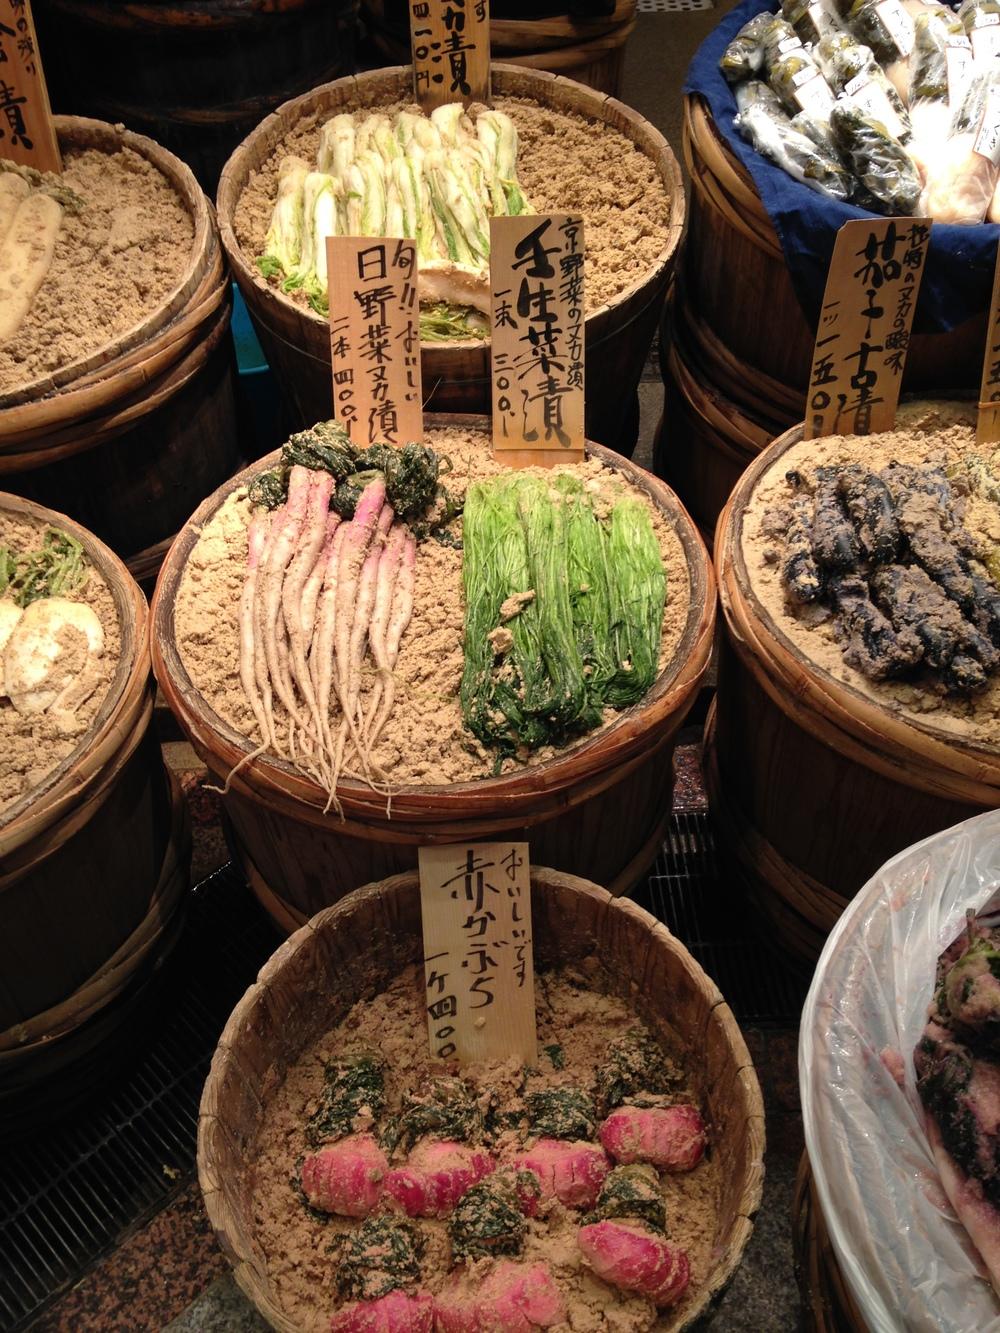 fermenting vegetables at Nishiki Market